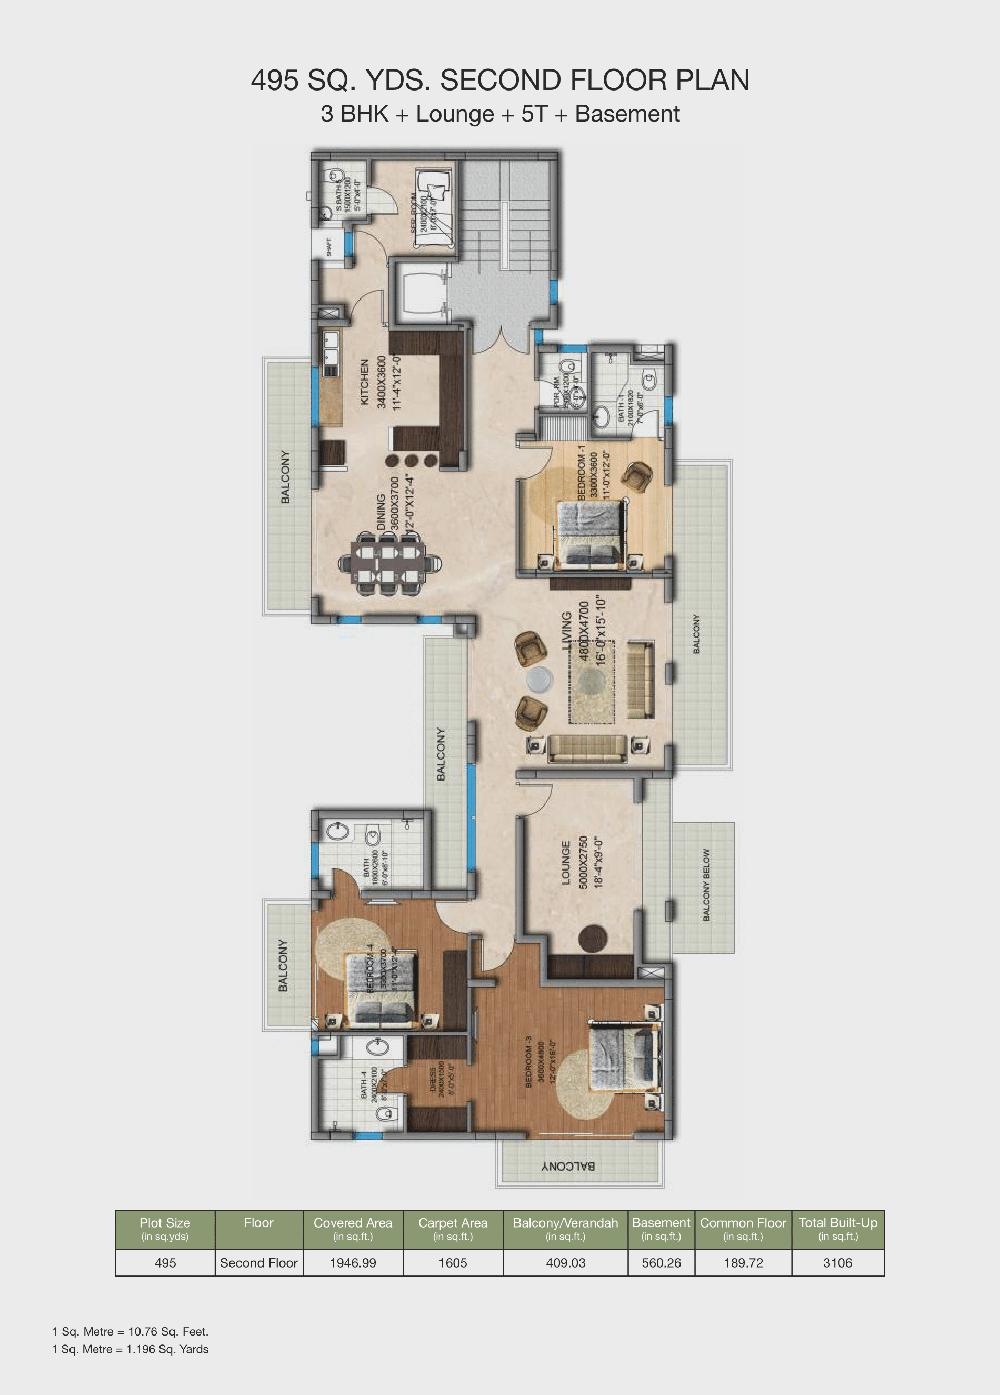 amstoria floor plan